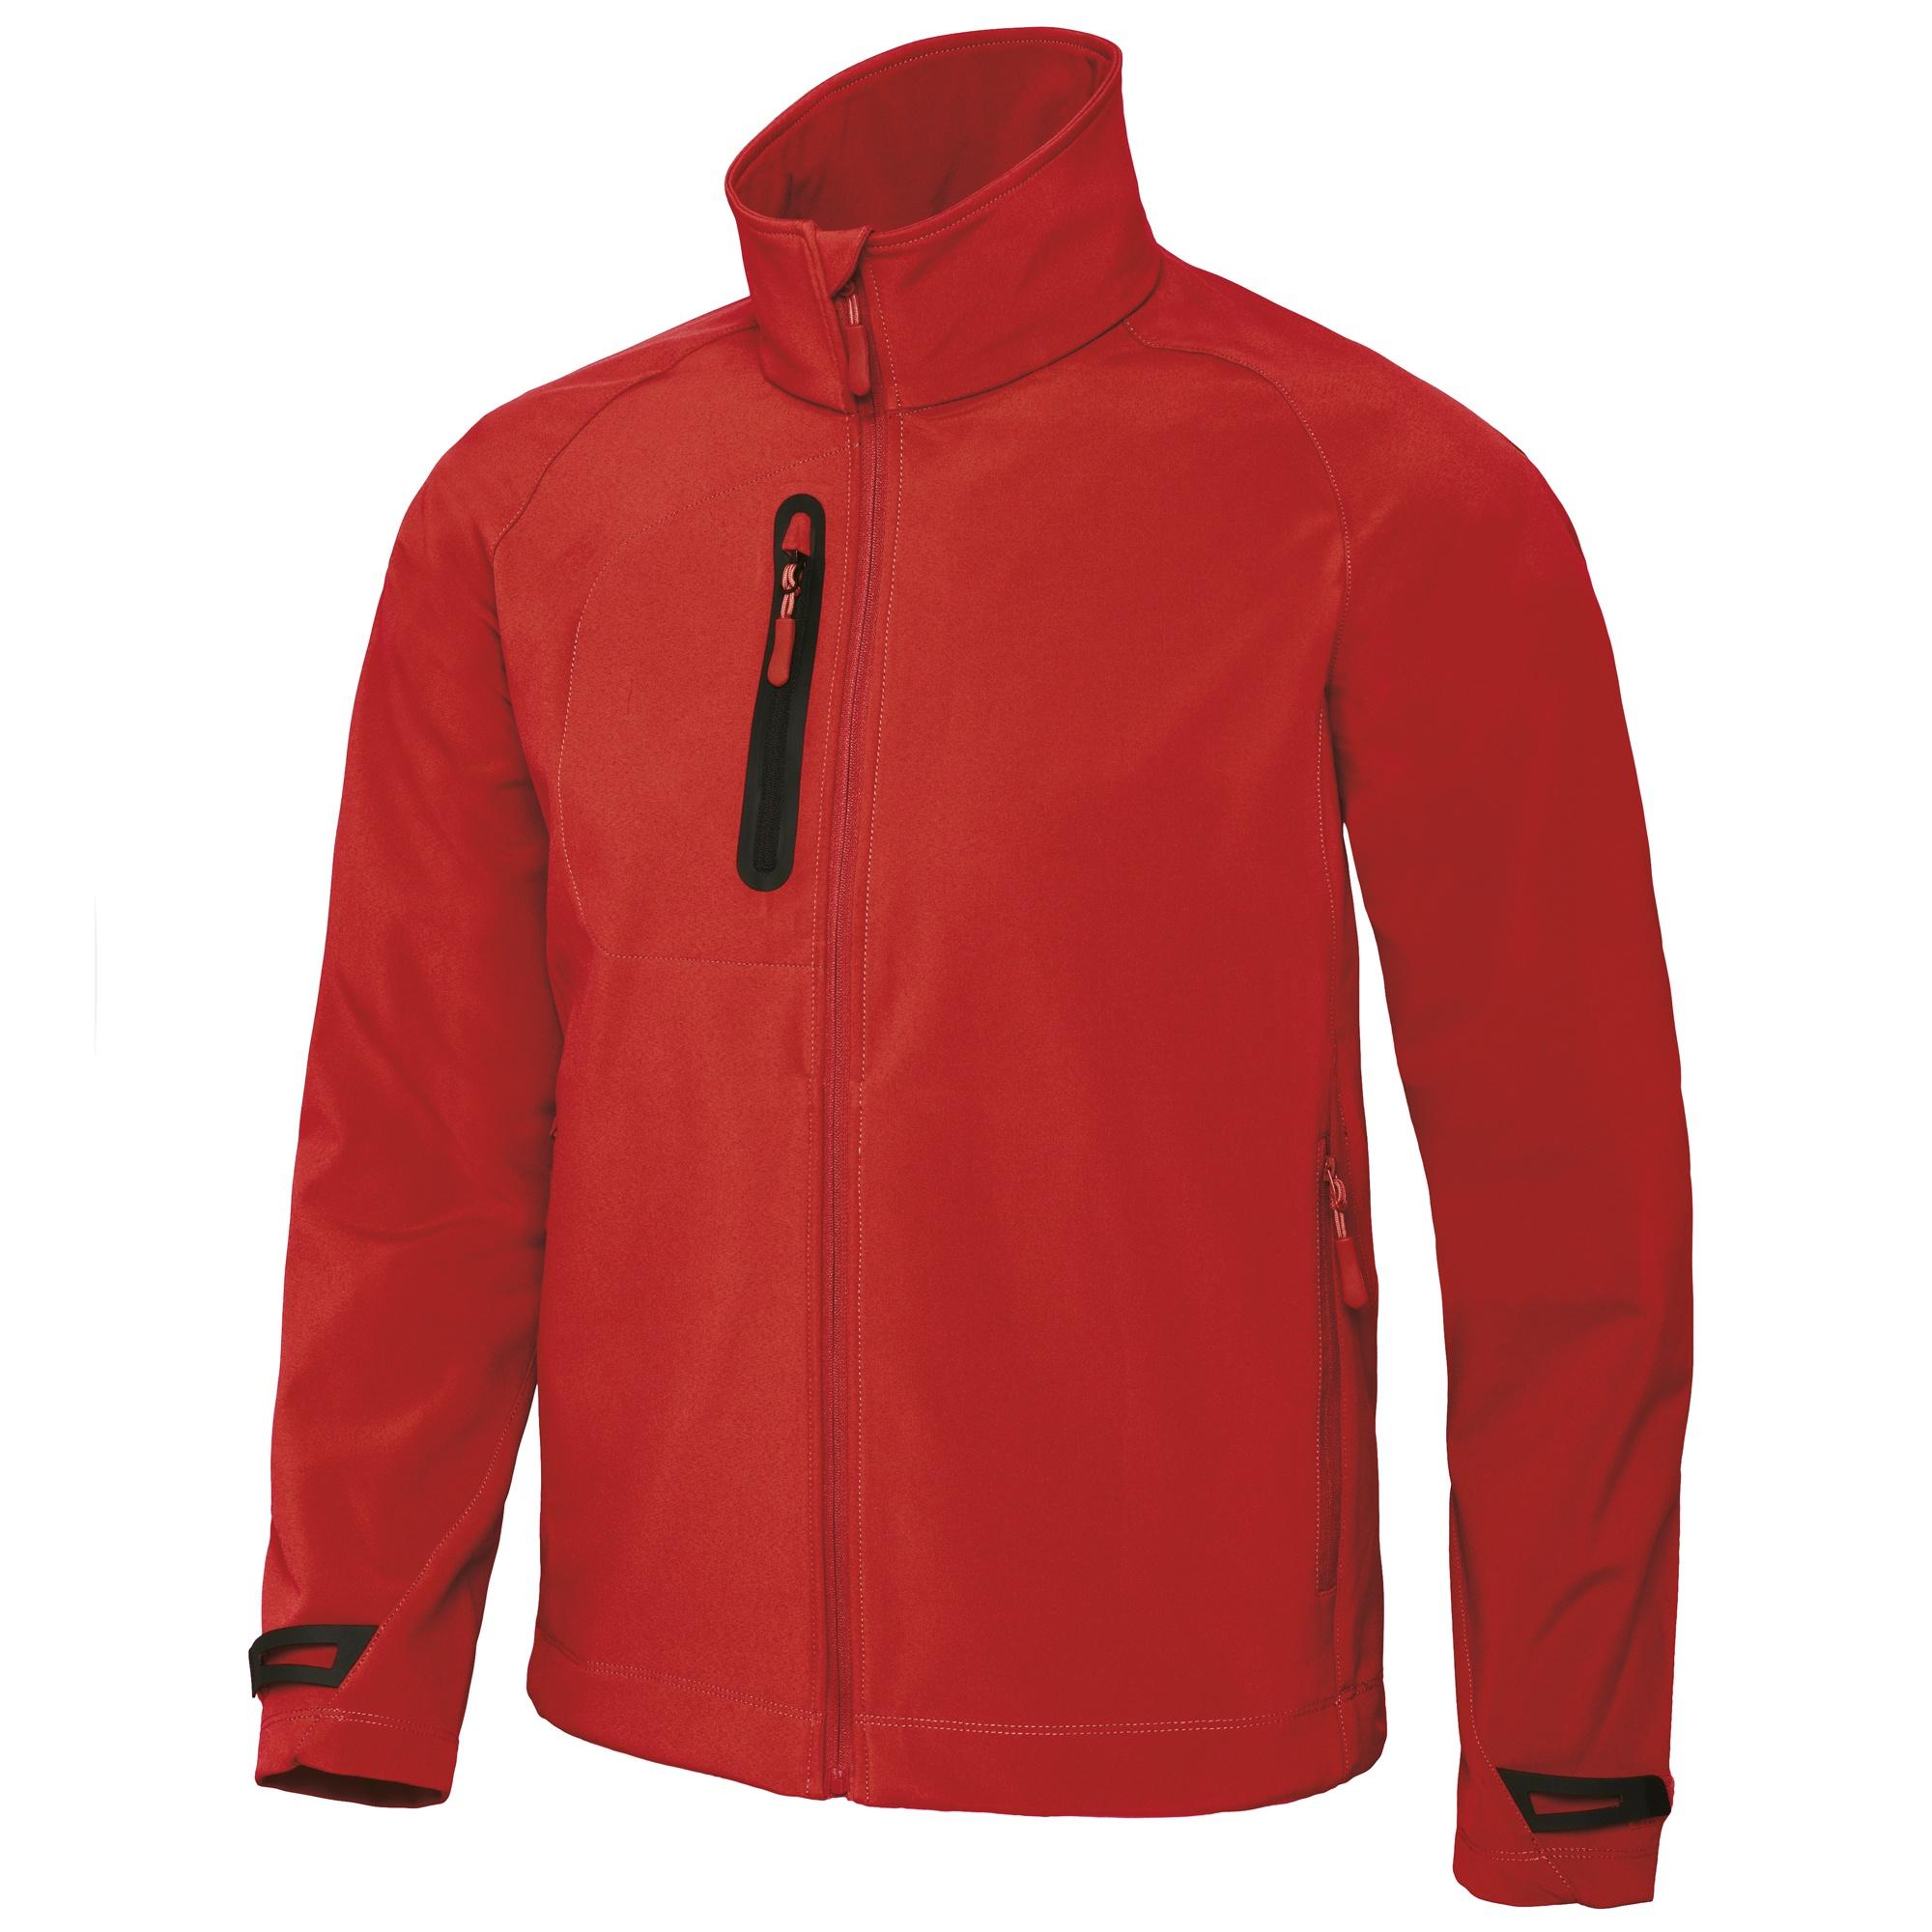 B&C Mens X-Lite 3 Layer Softshell Performance Jacket (S) (Deep Red)